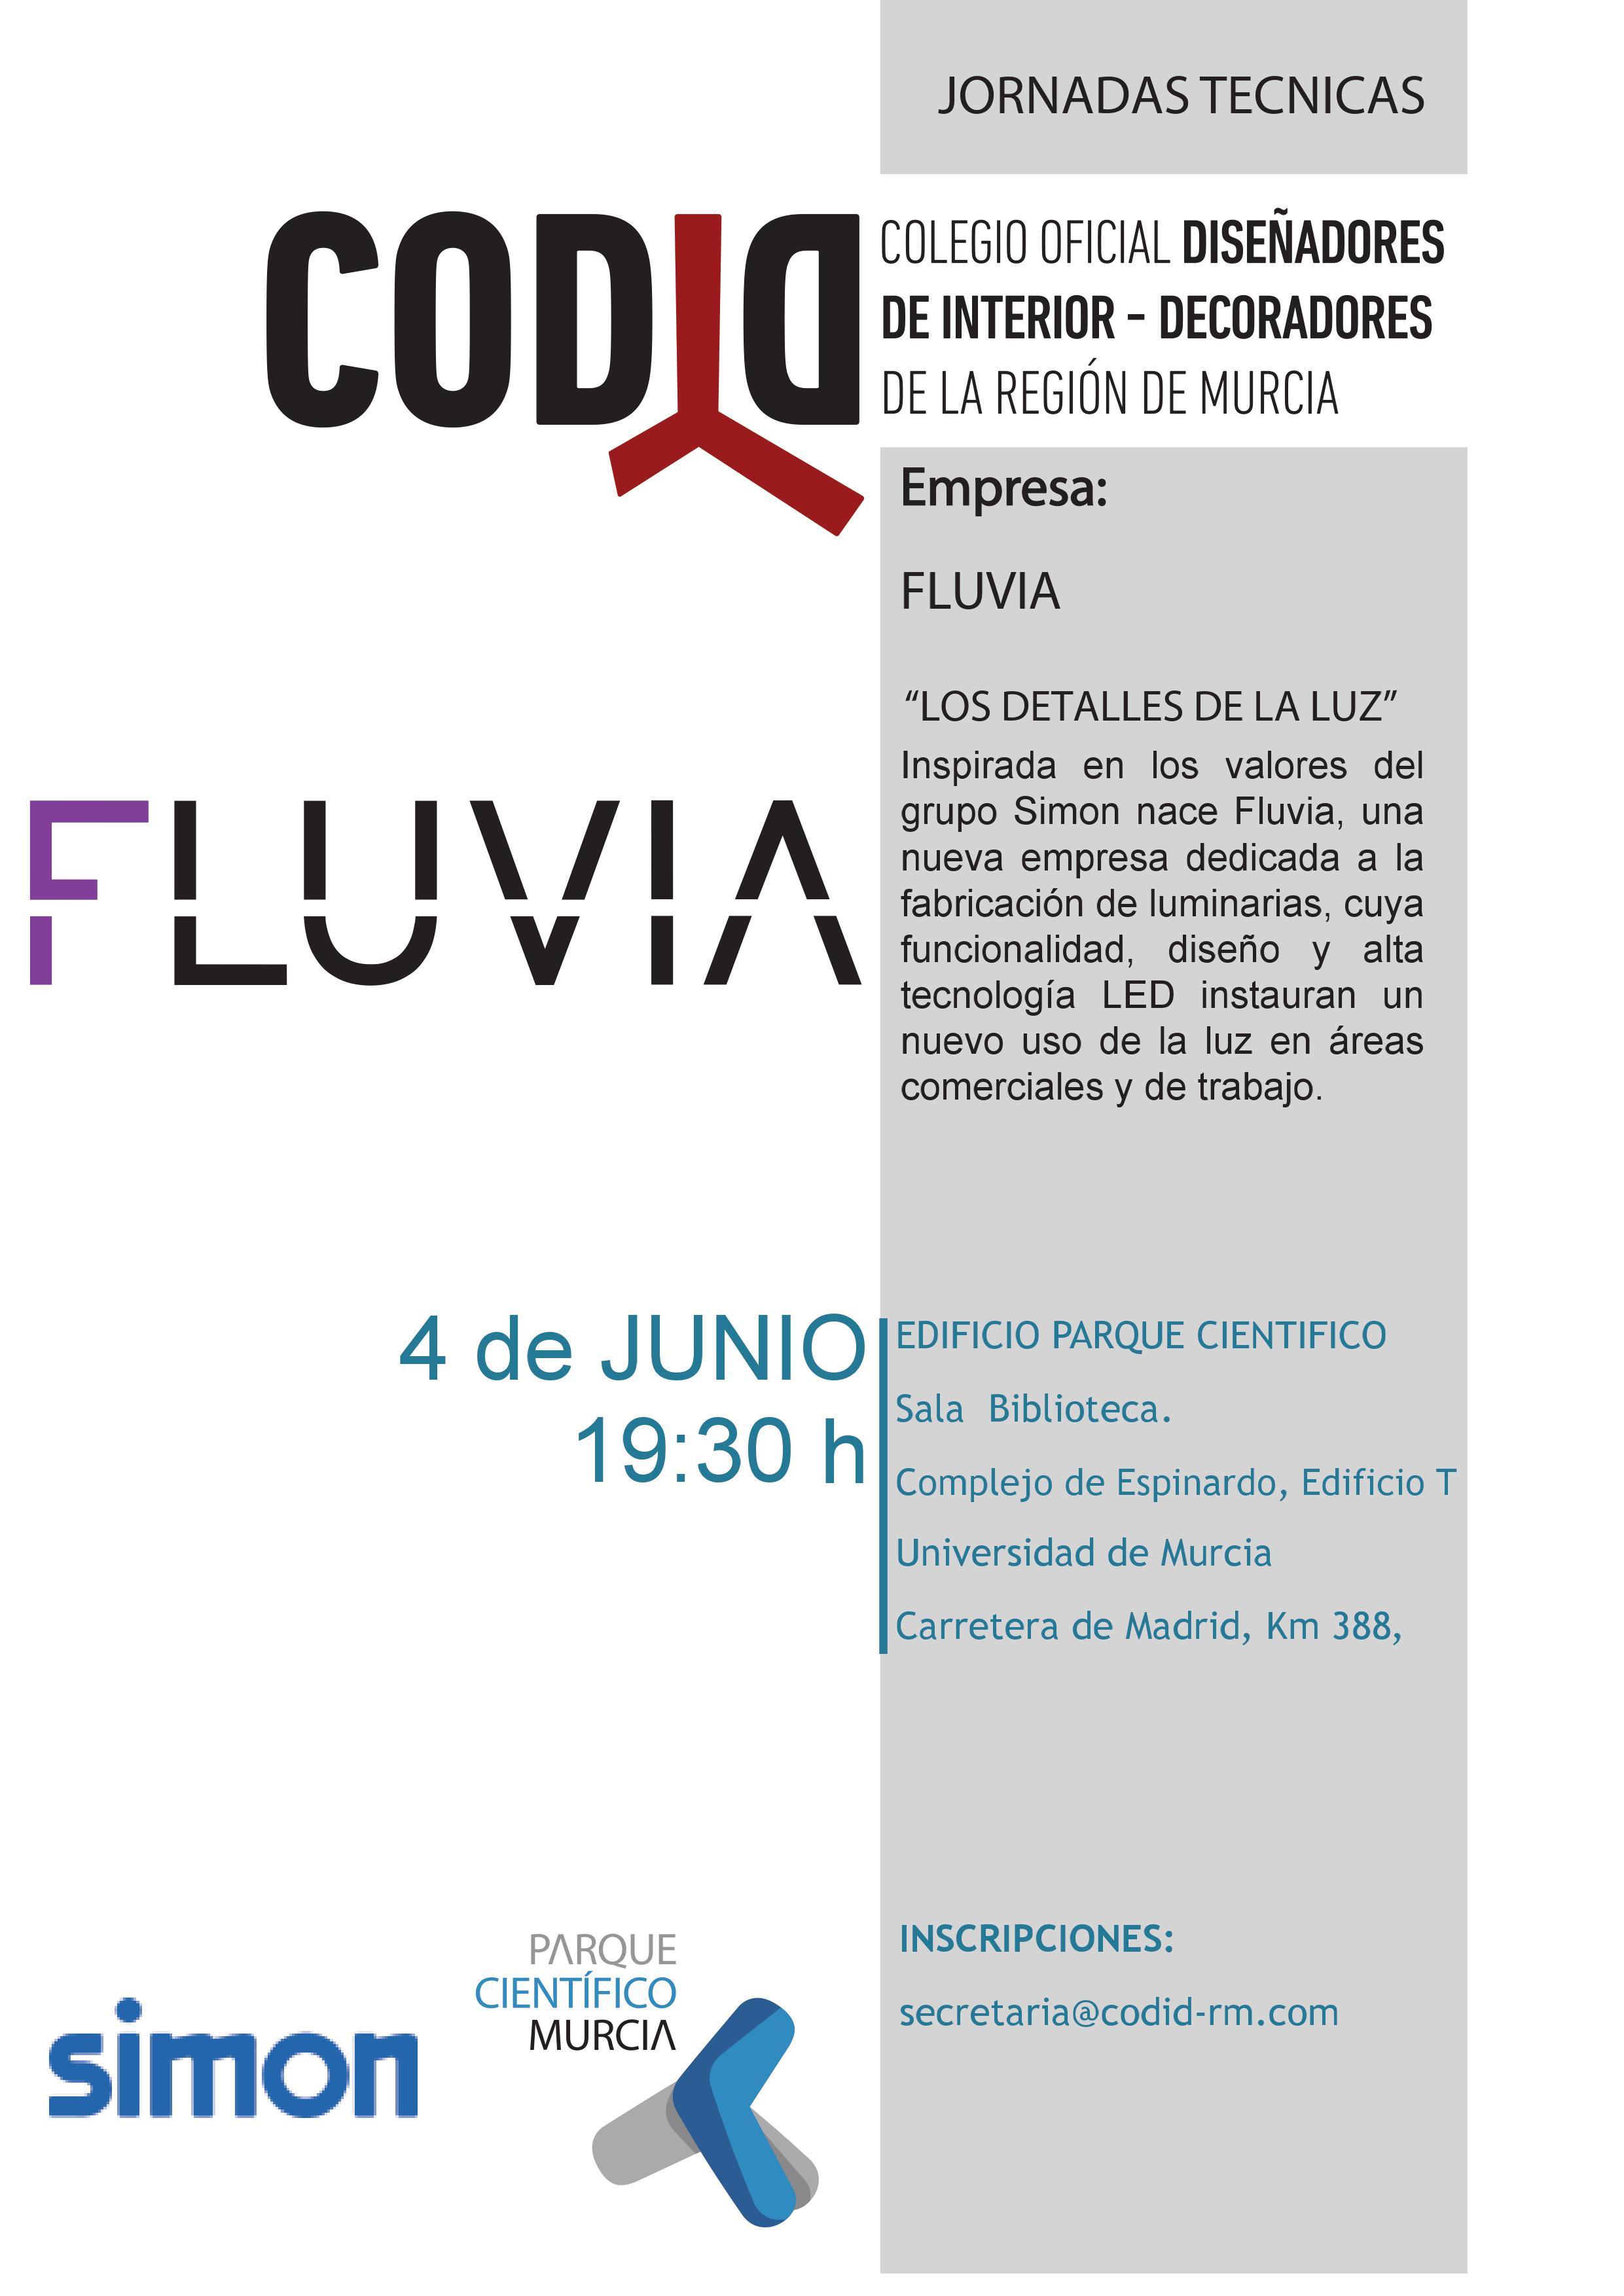 Imagen 1 JORNADA DE PRESENTACIÓN DE FLUVIA